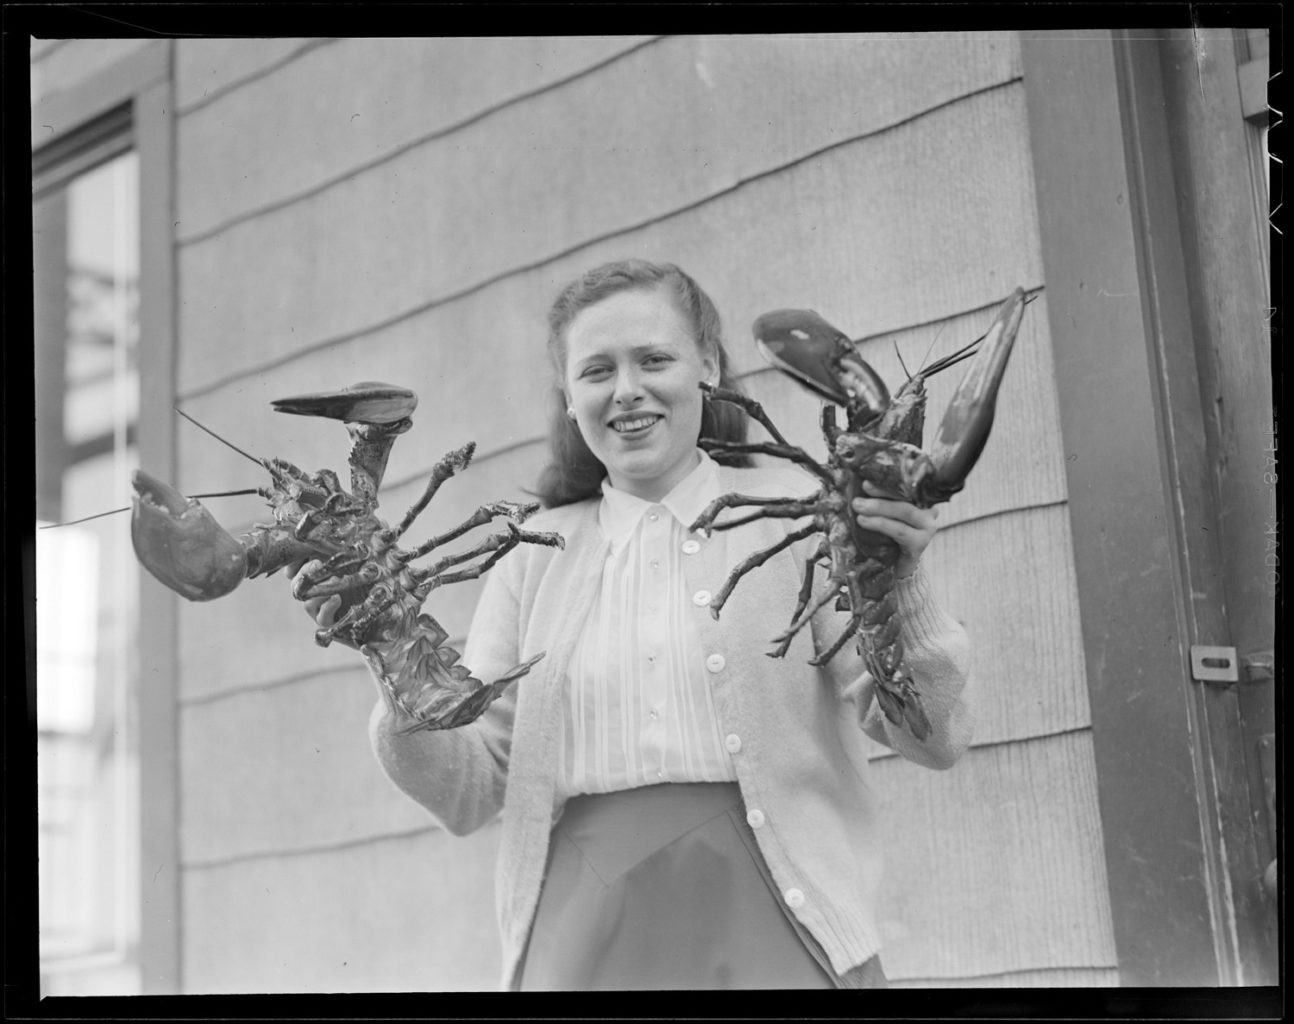 noch nicht bezahlt (© Boston Public Library)